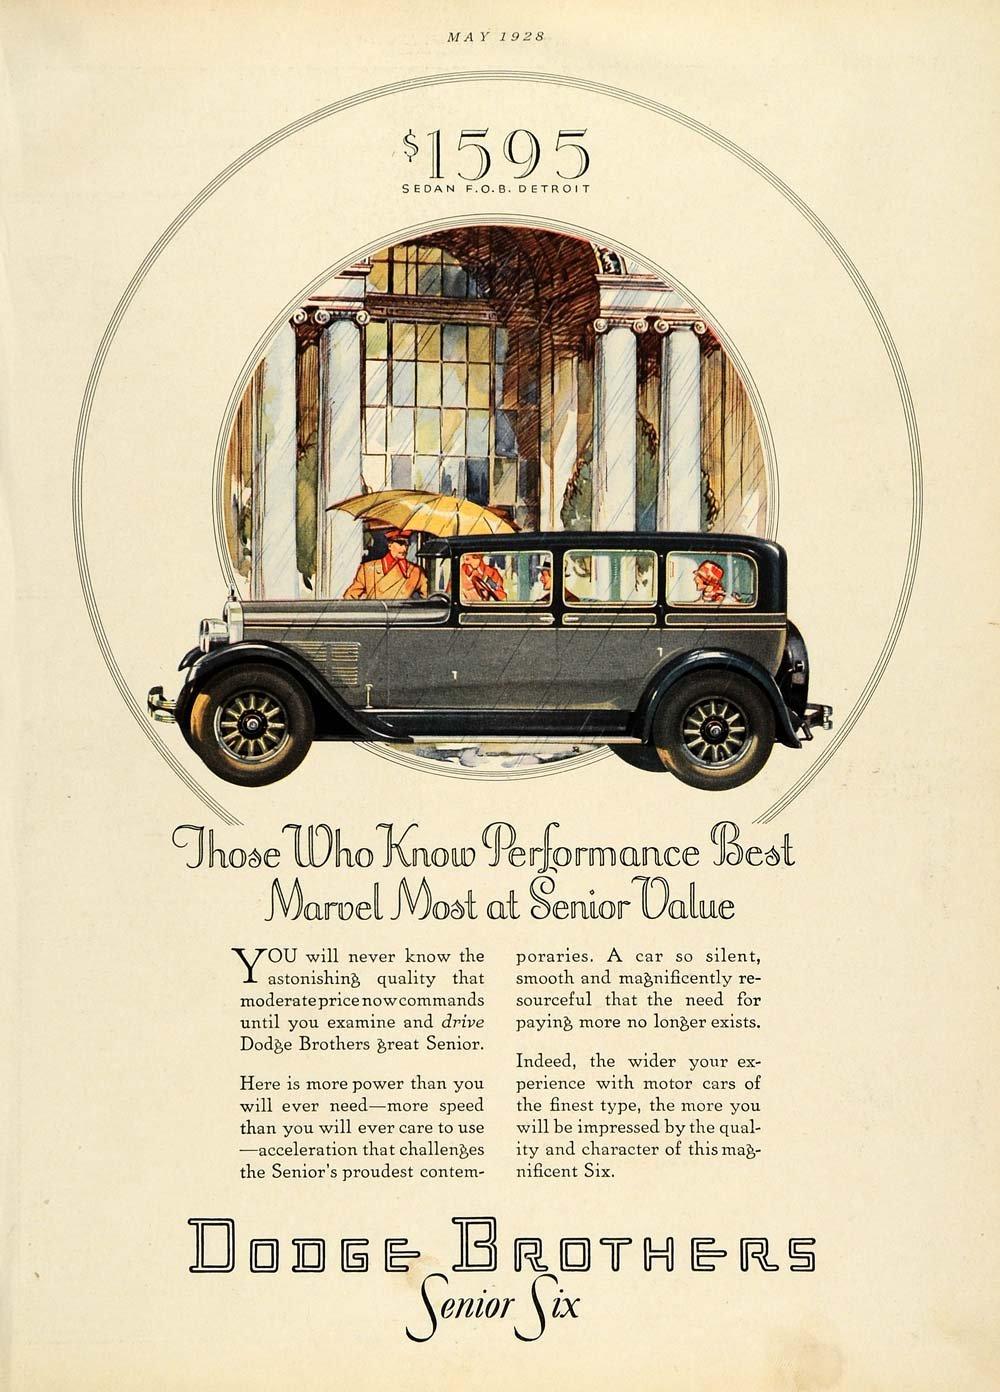 1928 Ad Dodge Brothers Senior Six Automobile Vintage Motor Vehicle Sedan Car  - Original Print Ad: Amazon.co.uk: Kitchen & Home